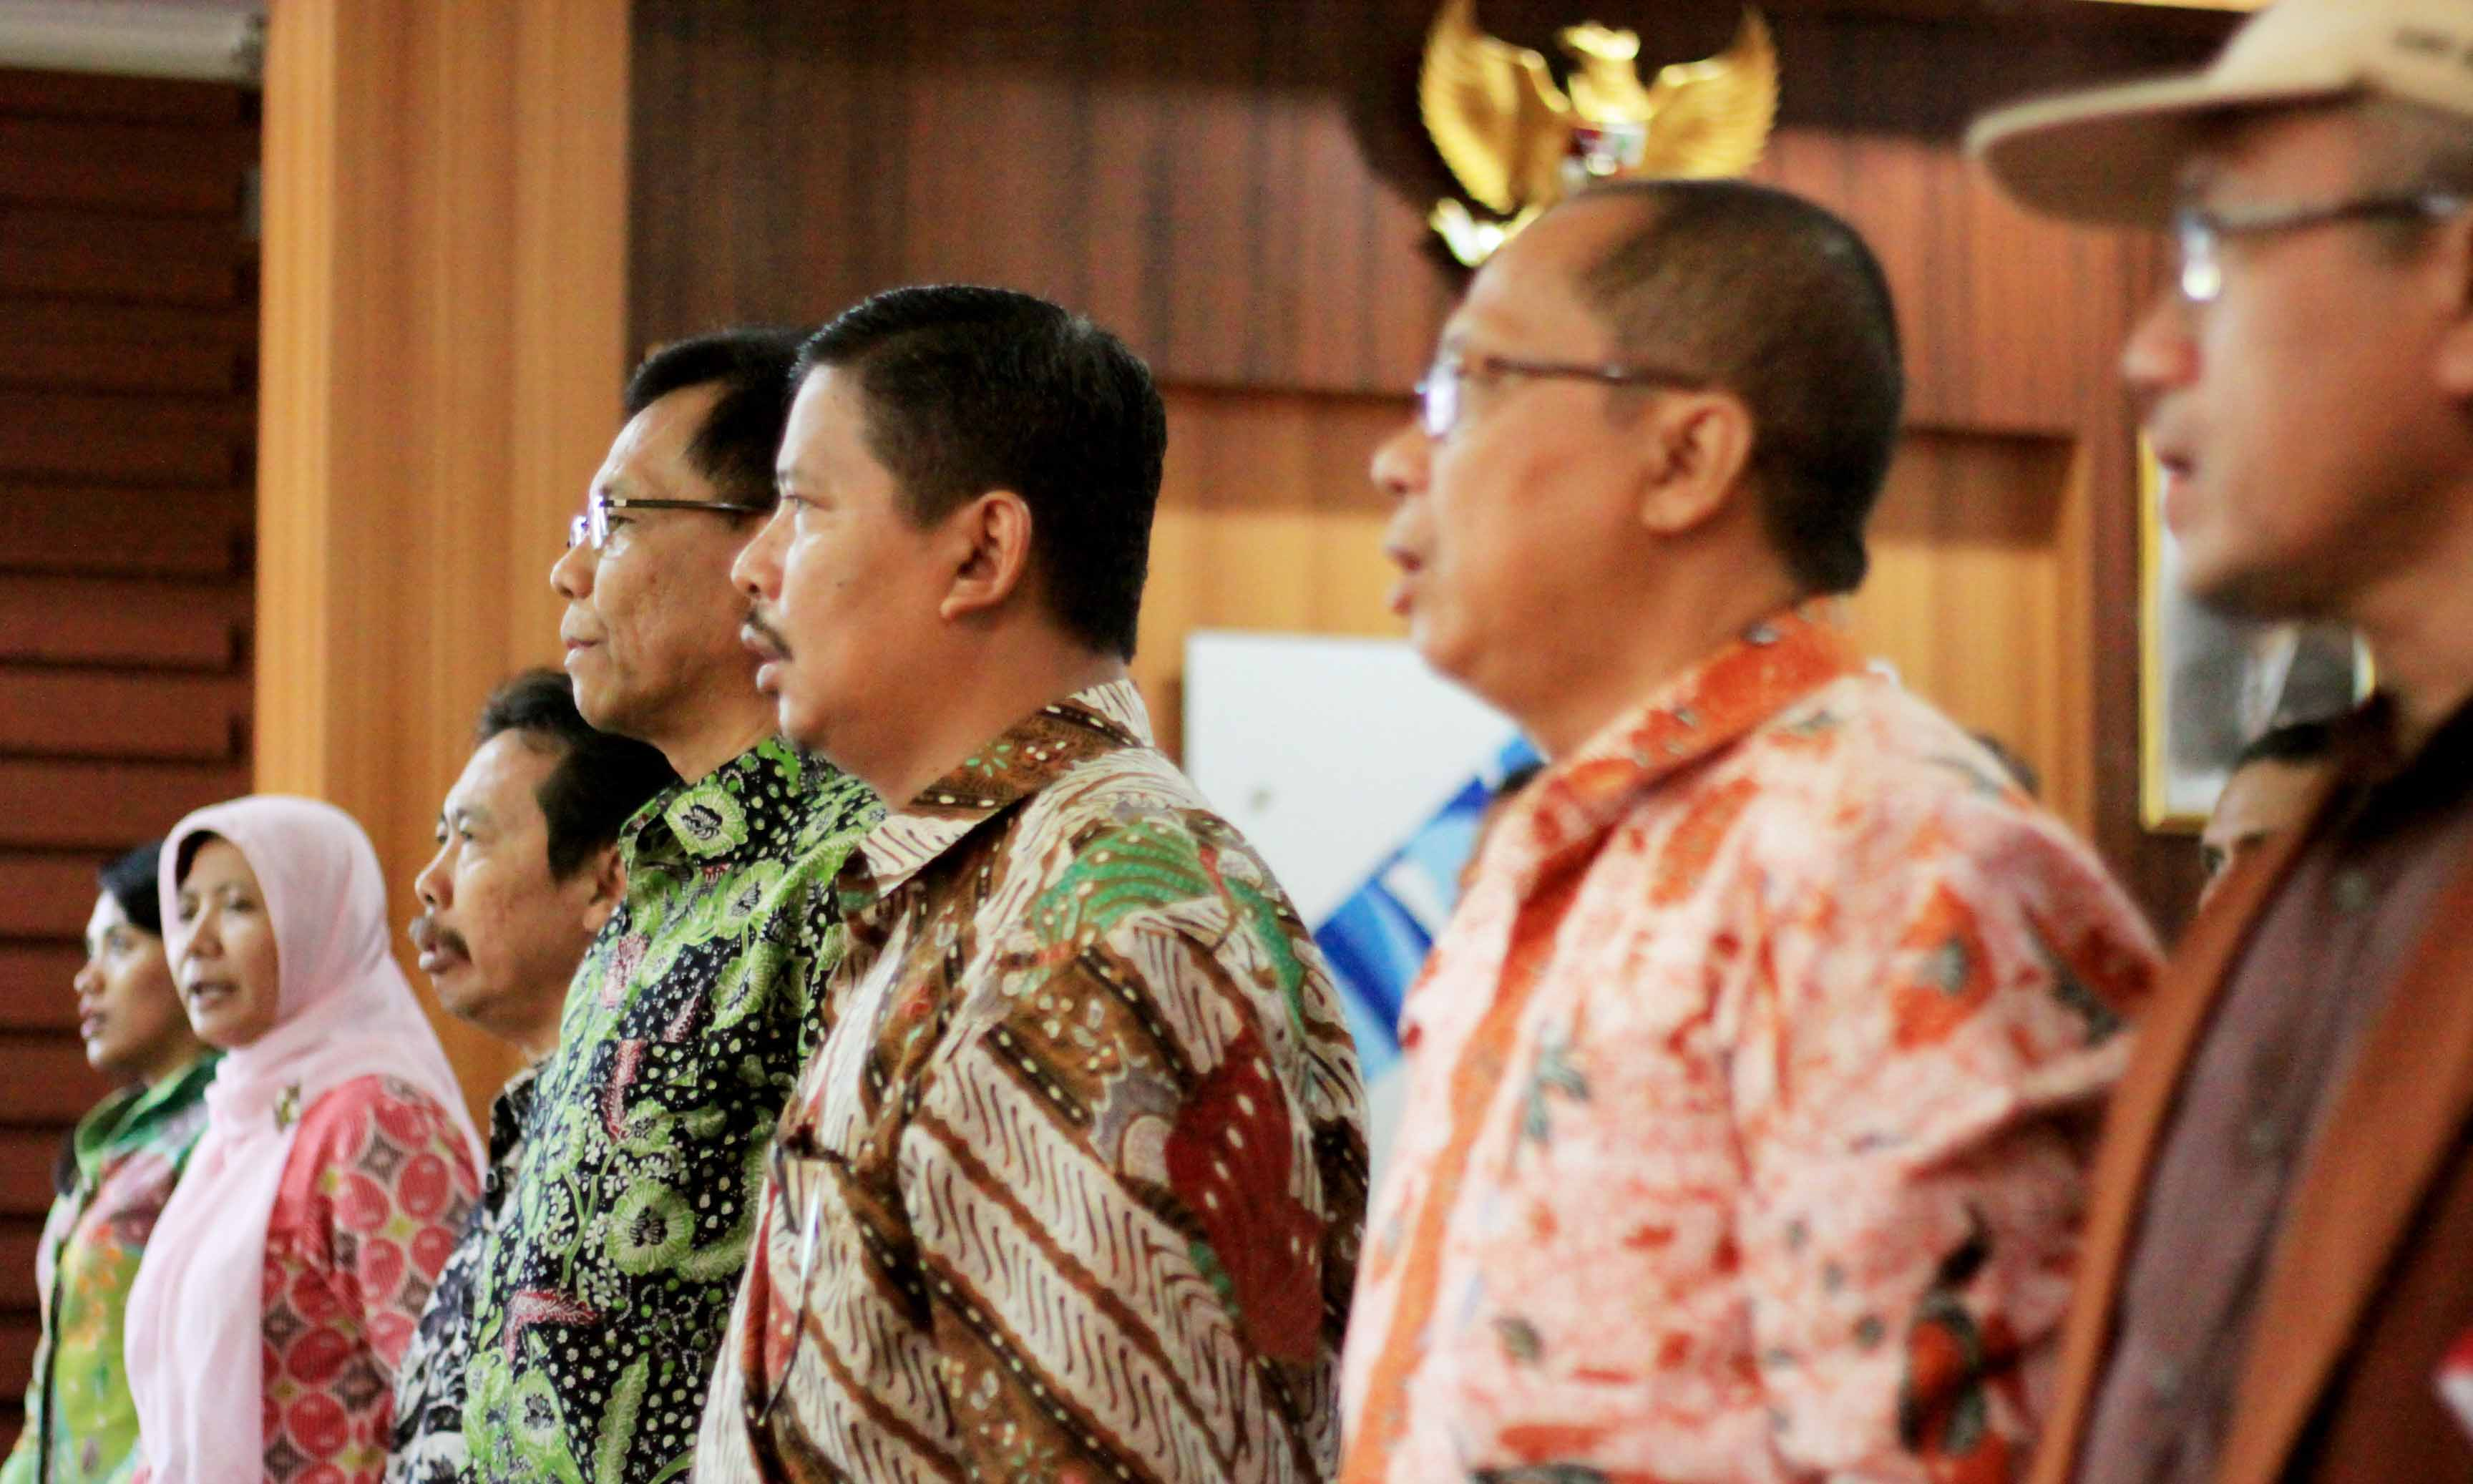 Foto : Hairul Akbar Suasana menyanyikan lagu kebangsaan Indonesia Raya pada Seminar Nasional Ketranmigrasian dan peresmian PMAT UIN Raden Fatah Palembang. bertempat di Gedung Rektorat UIN RF , pada Jumat (4/3/2016).